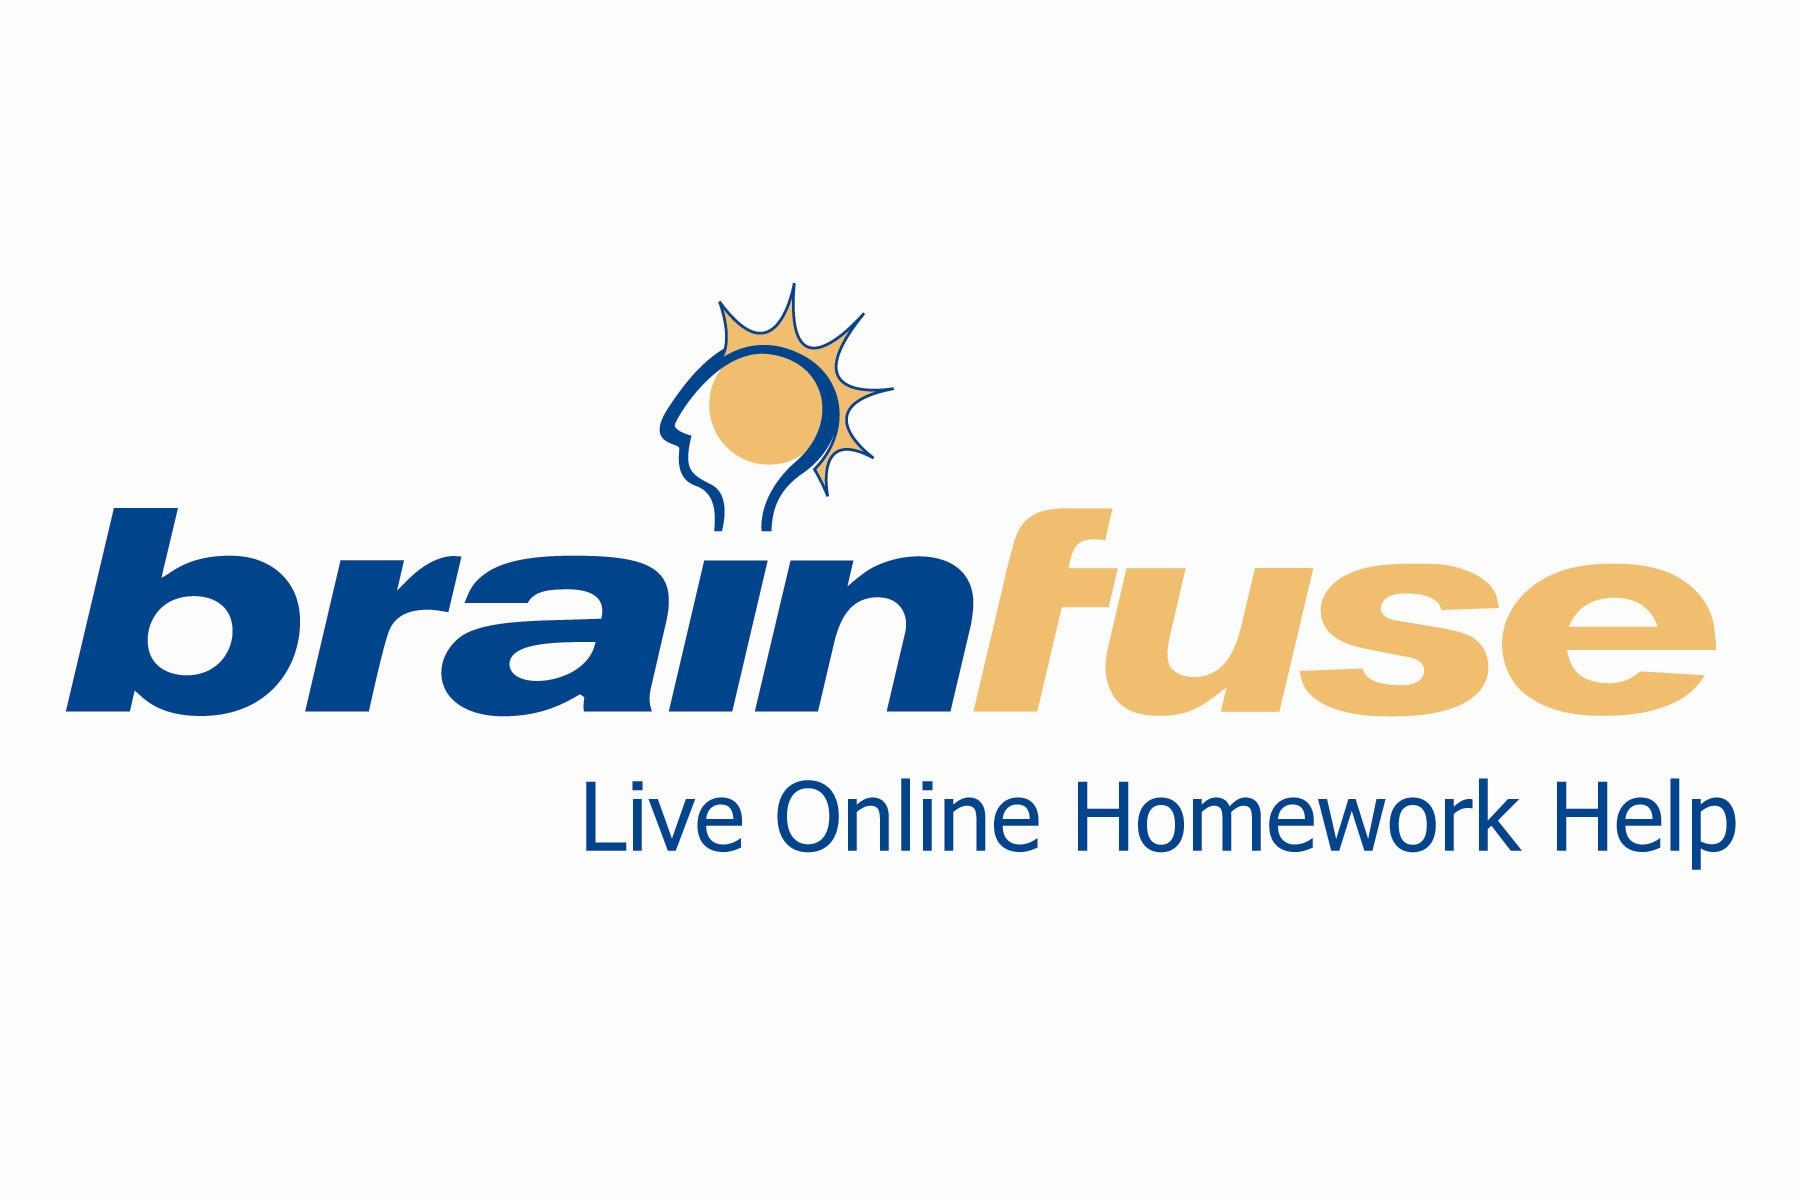 Hour live homework help